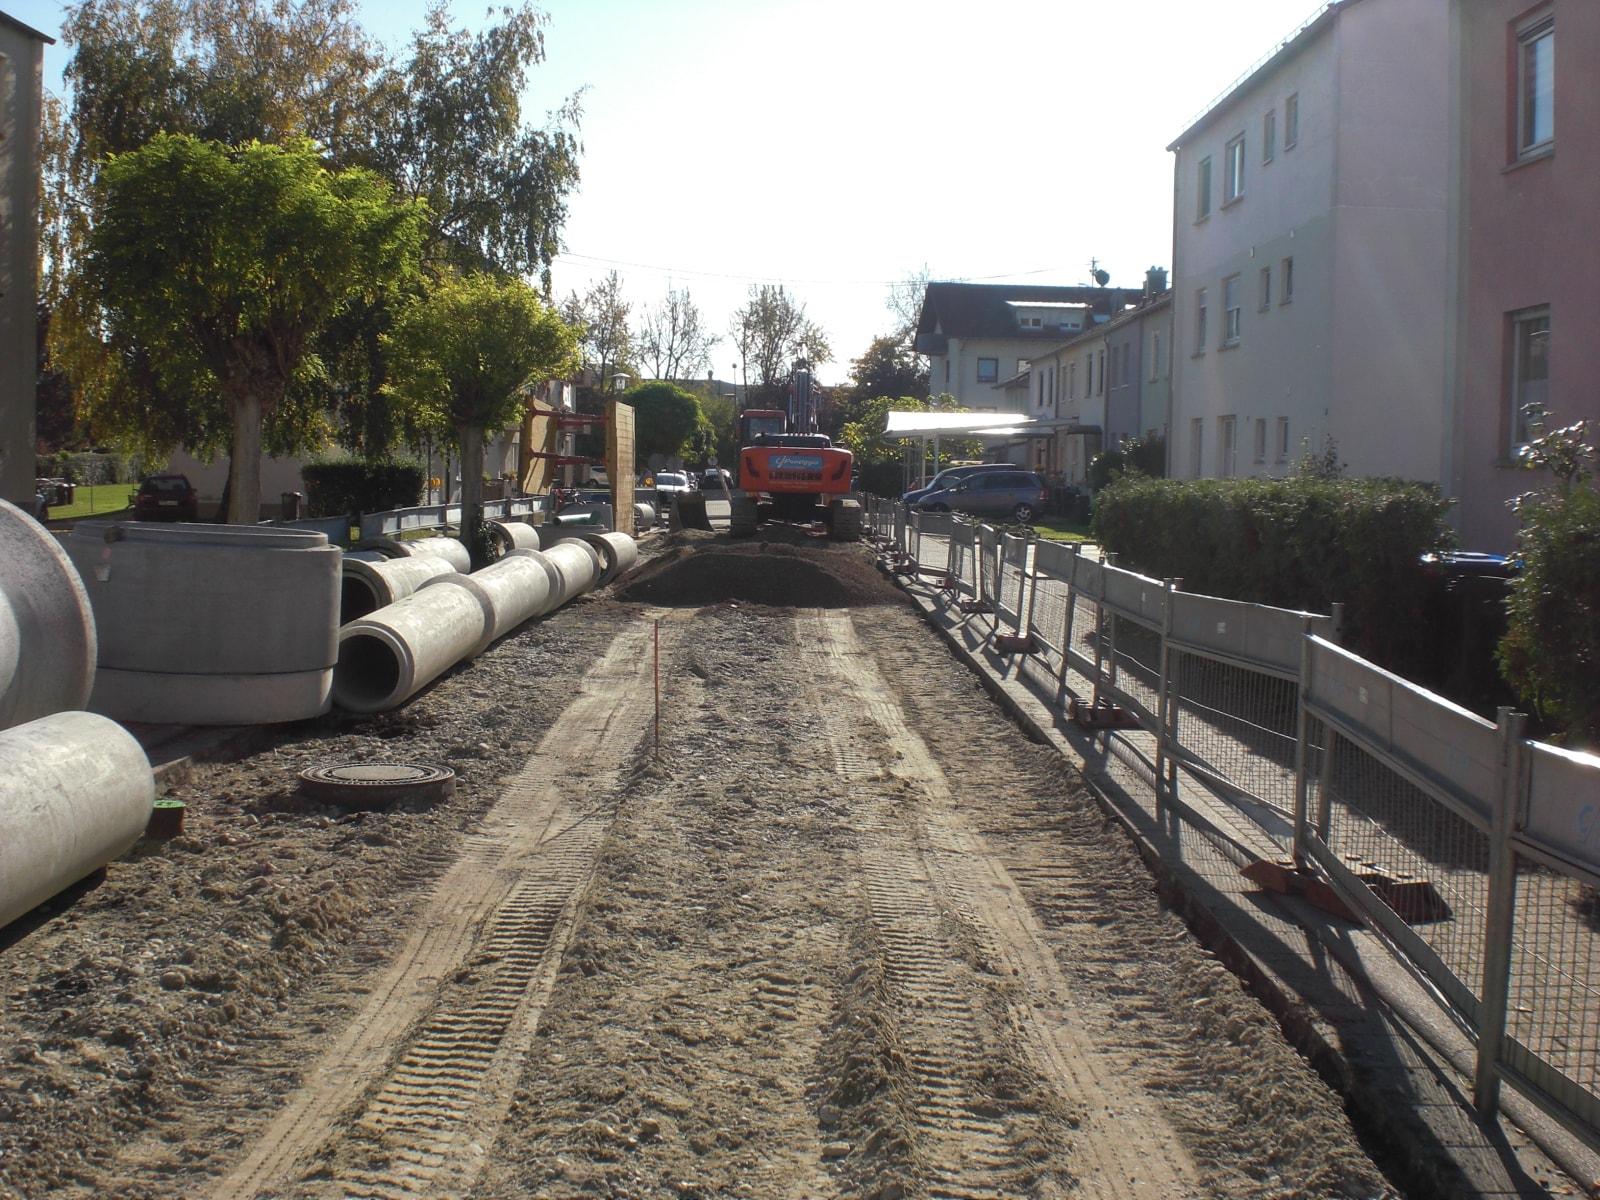 Kanalerneuerung Bötzingen